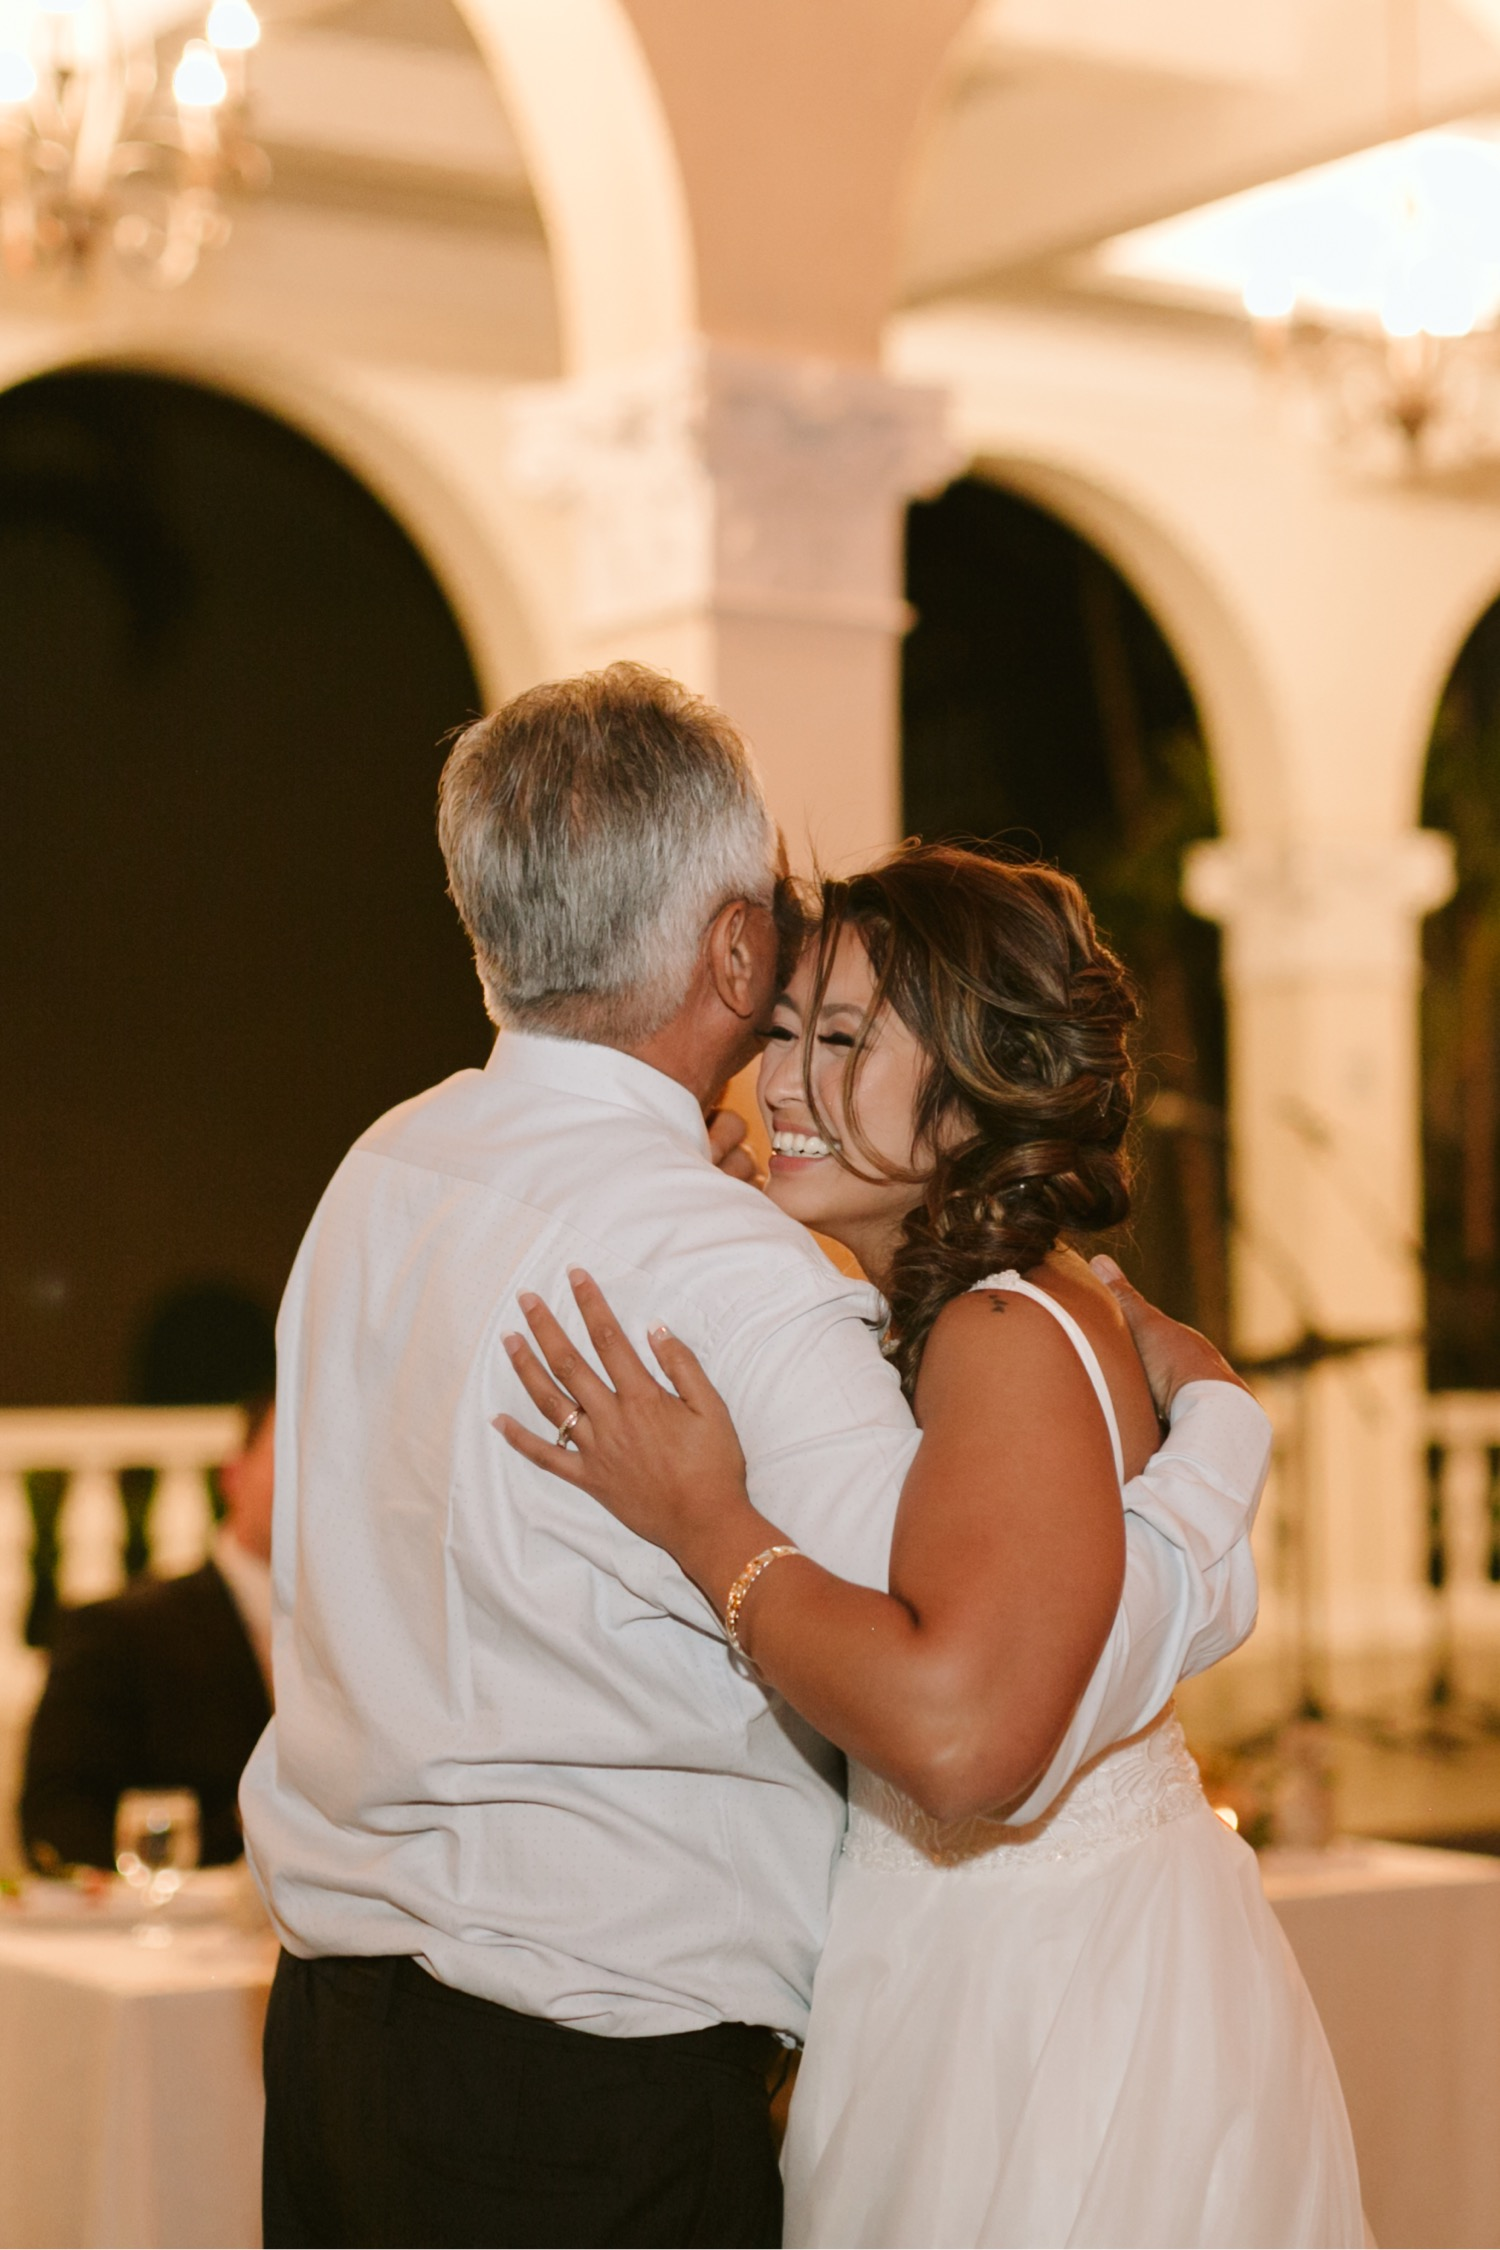 Julia_father_Hawaii_dance_Wedding_Honolulu_Cafe_Bride_daughter_reception.jpg